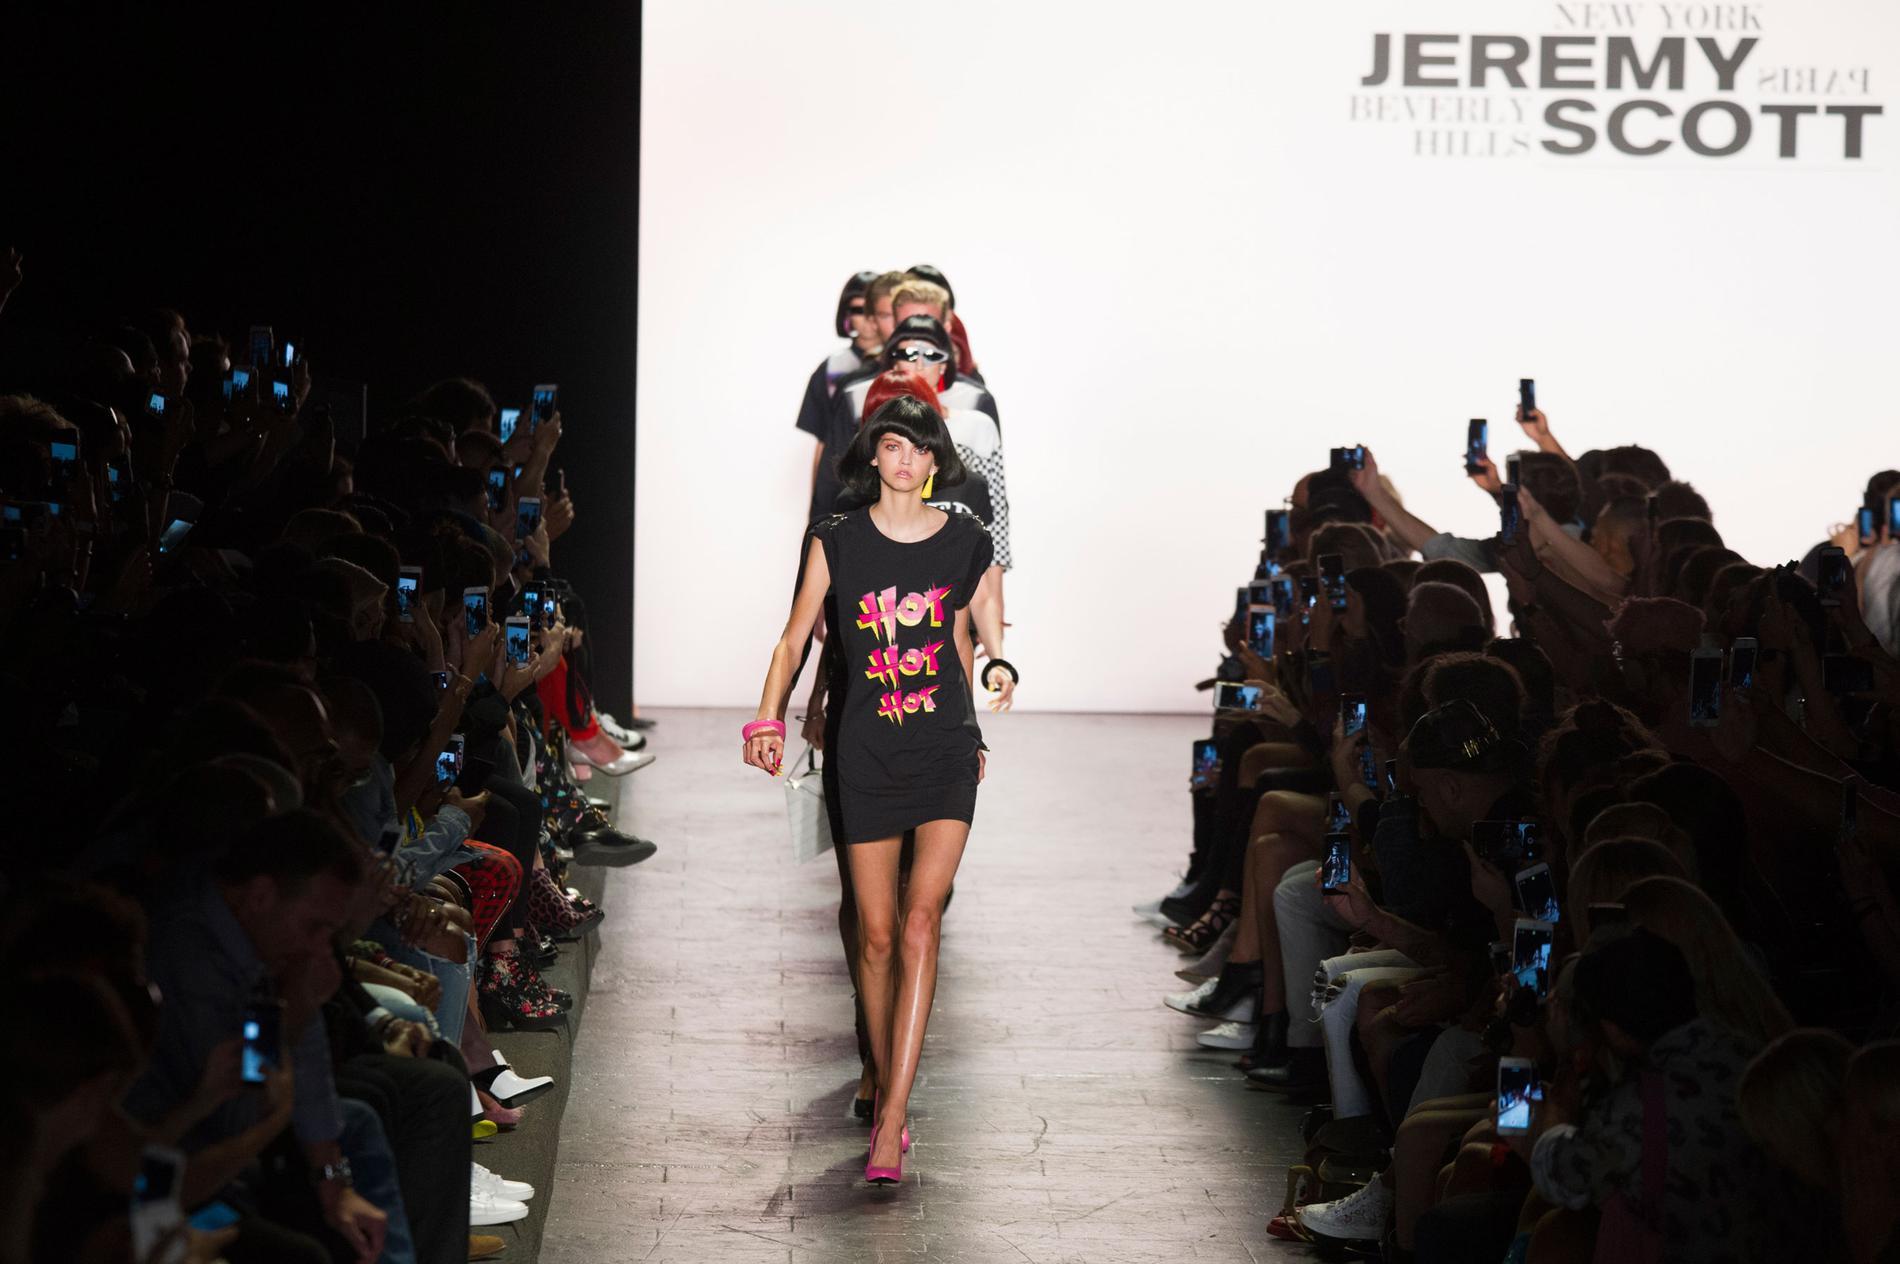 defile-jeremy-scott-printemps-ete-2017-new-york-look-57